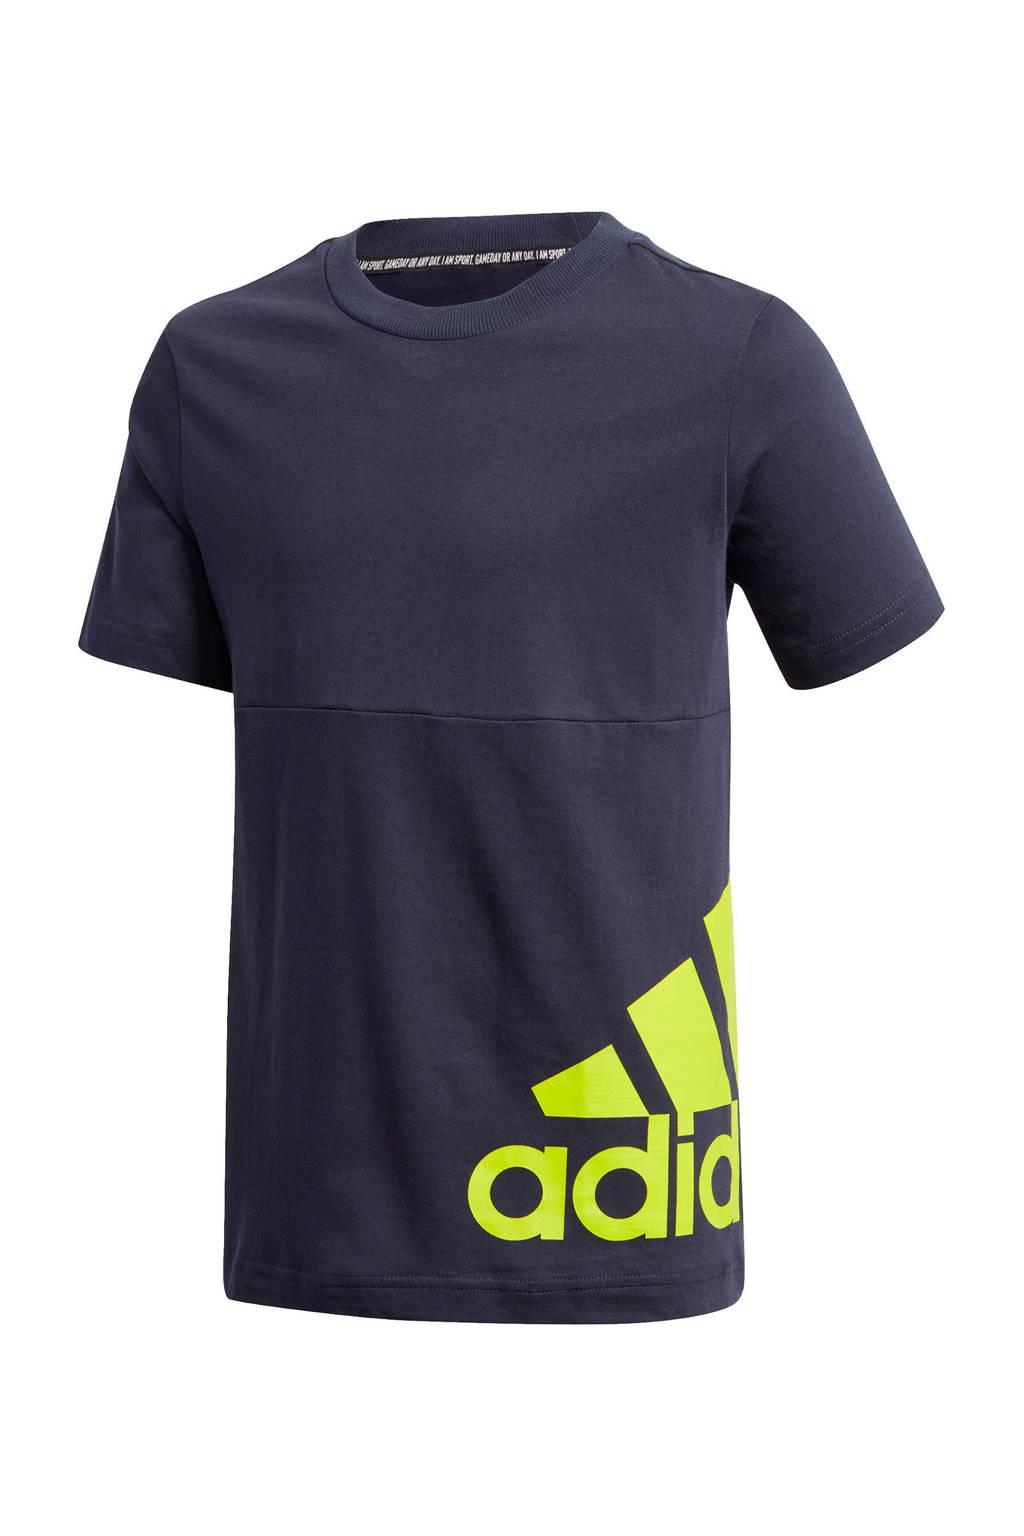 adidas Performance   sport T-shirt donkerblauw/limegroen, Donkerblauw/limegroen